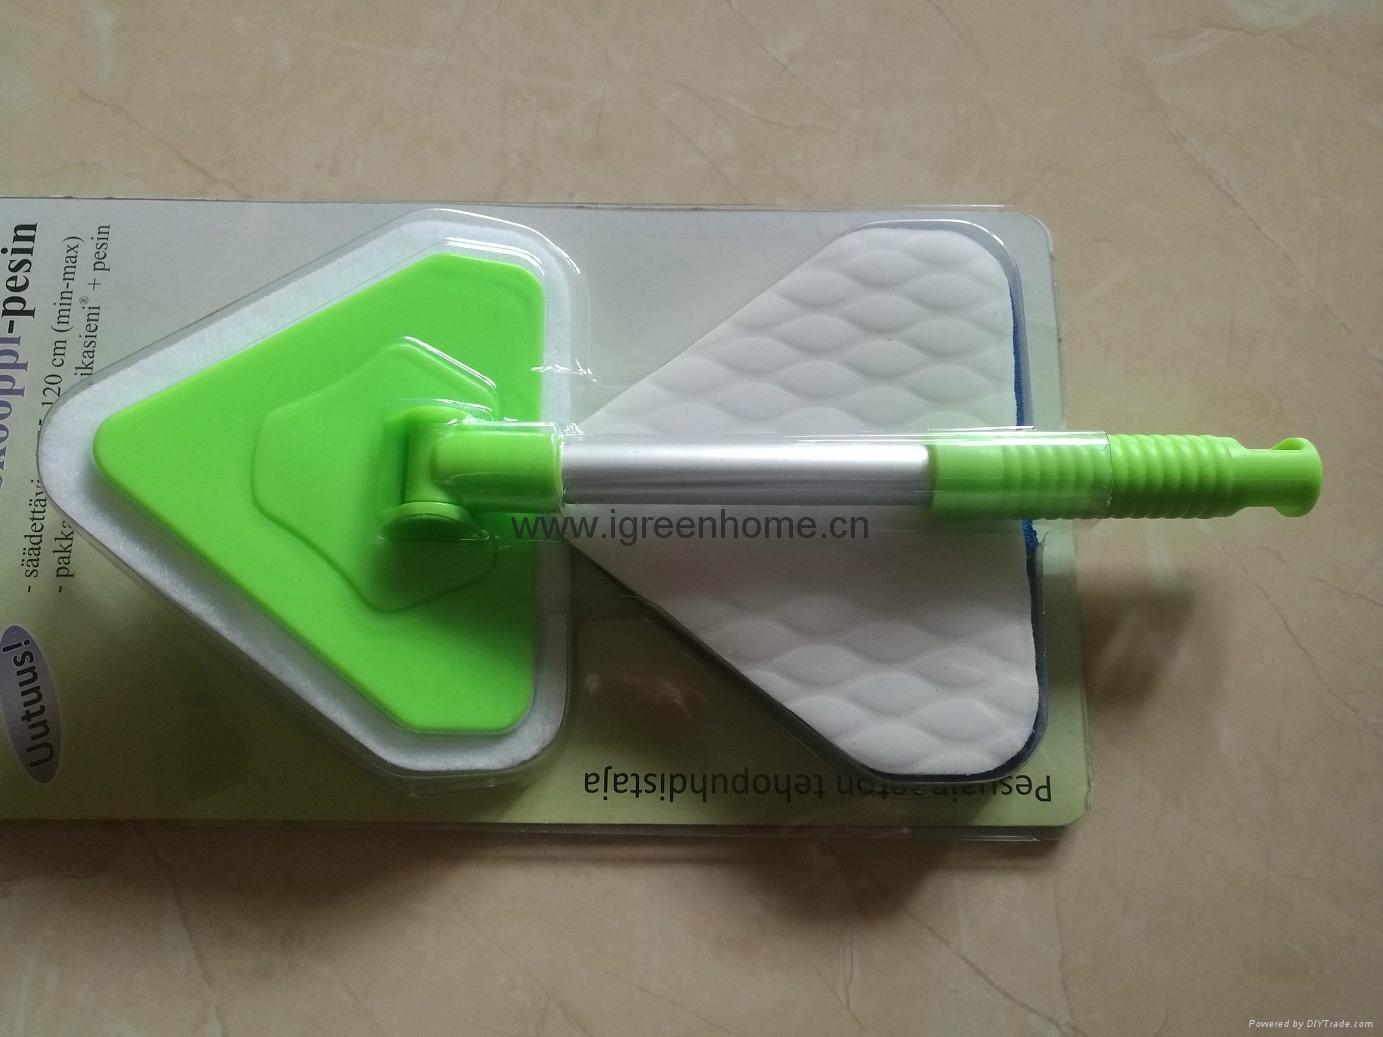 melamine sponge cleaning mop 1